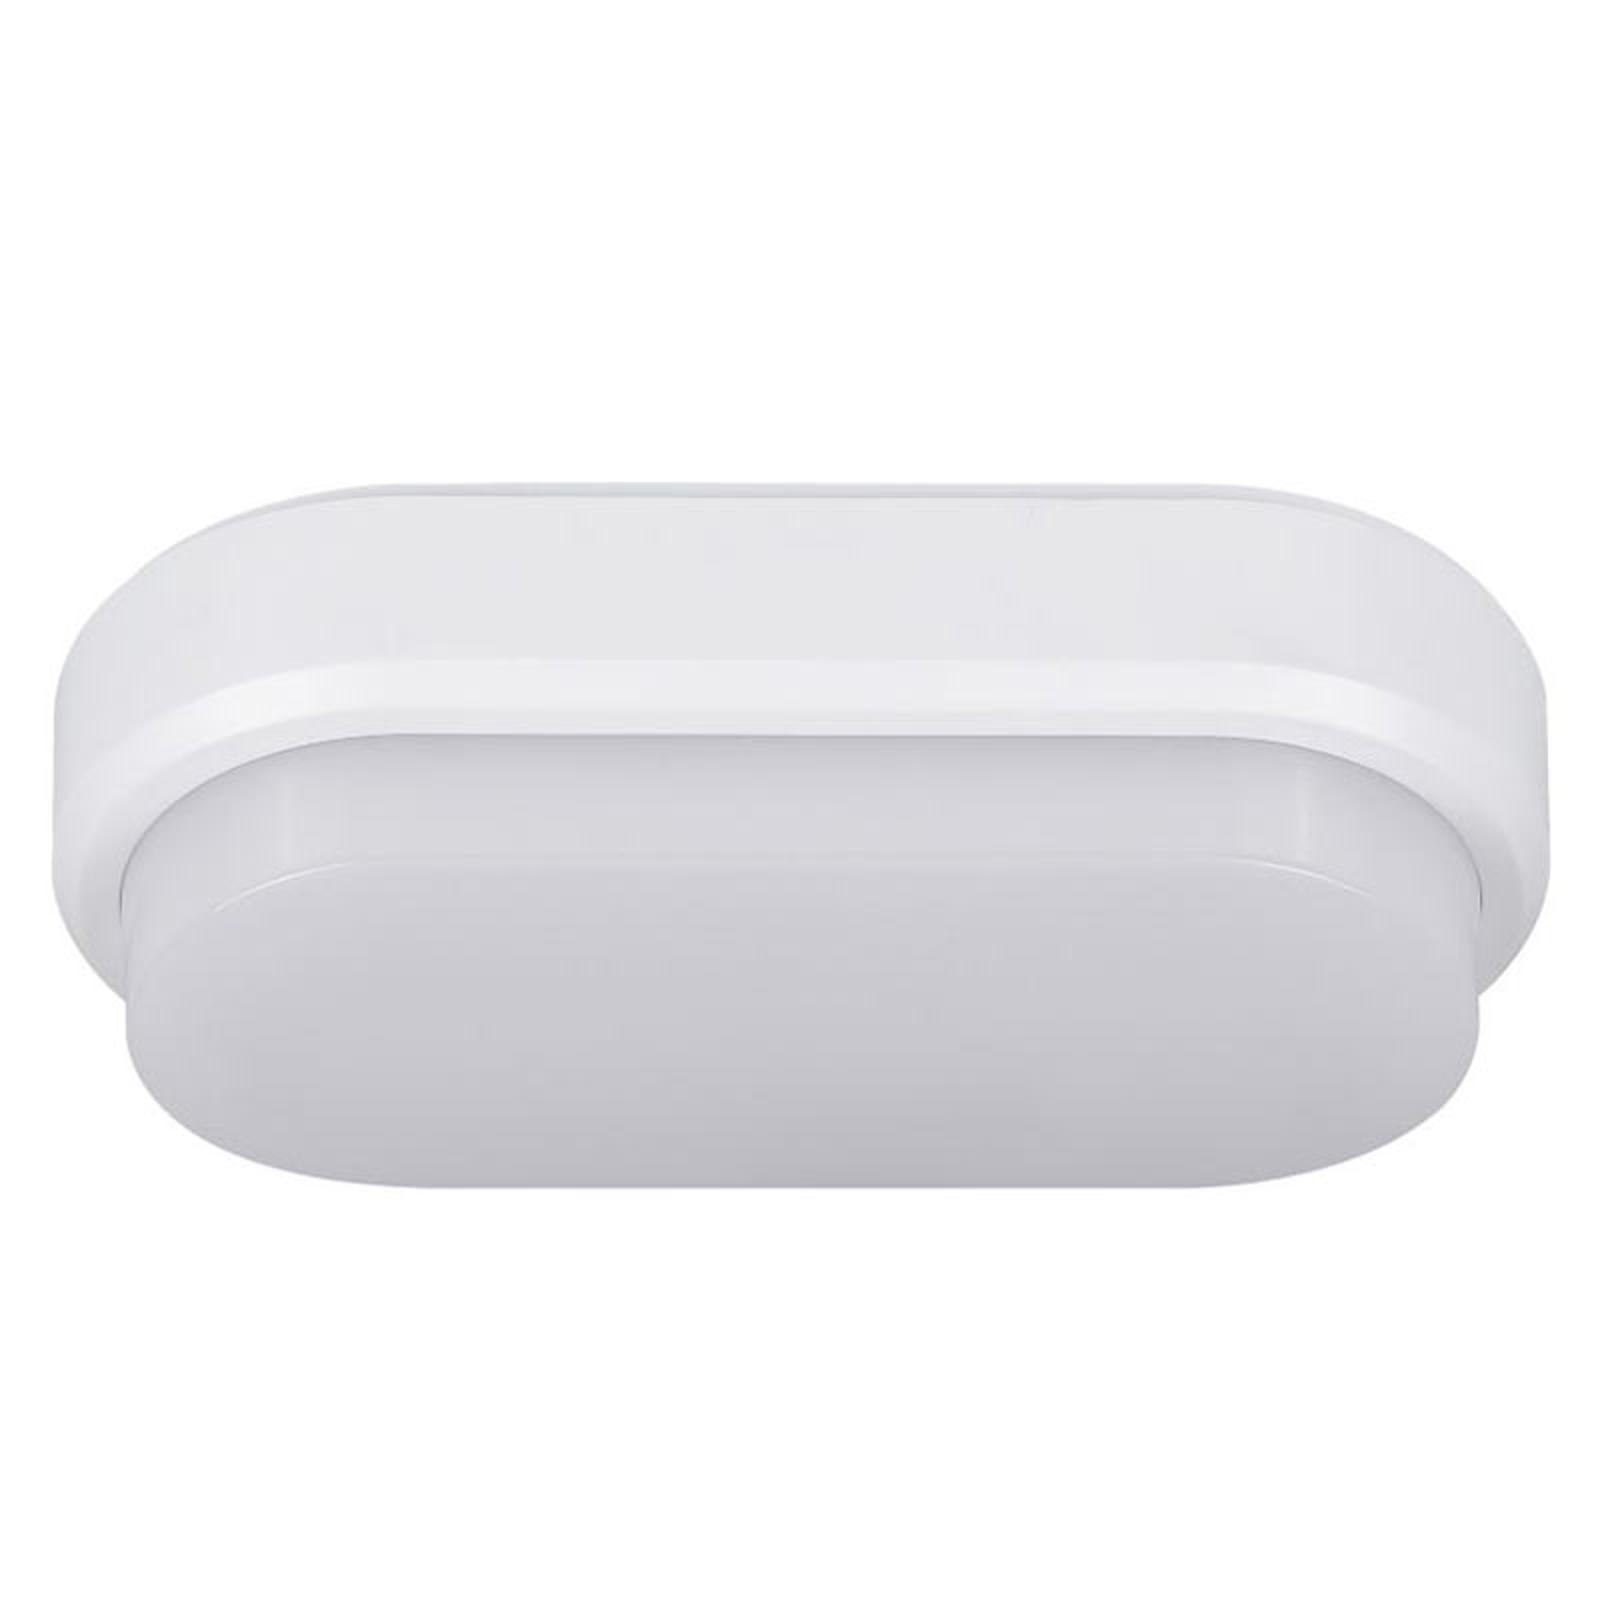 Bulkhead - oval LED ceiling light_8559270_1